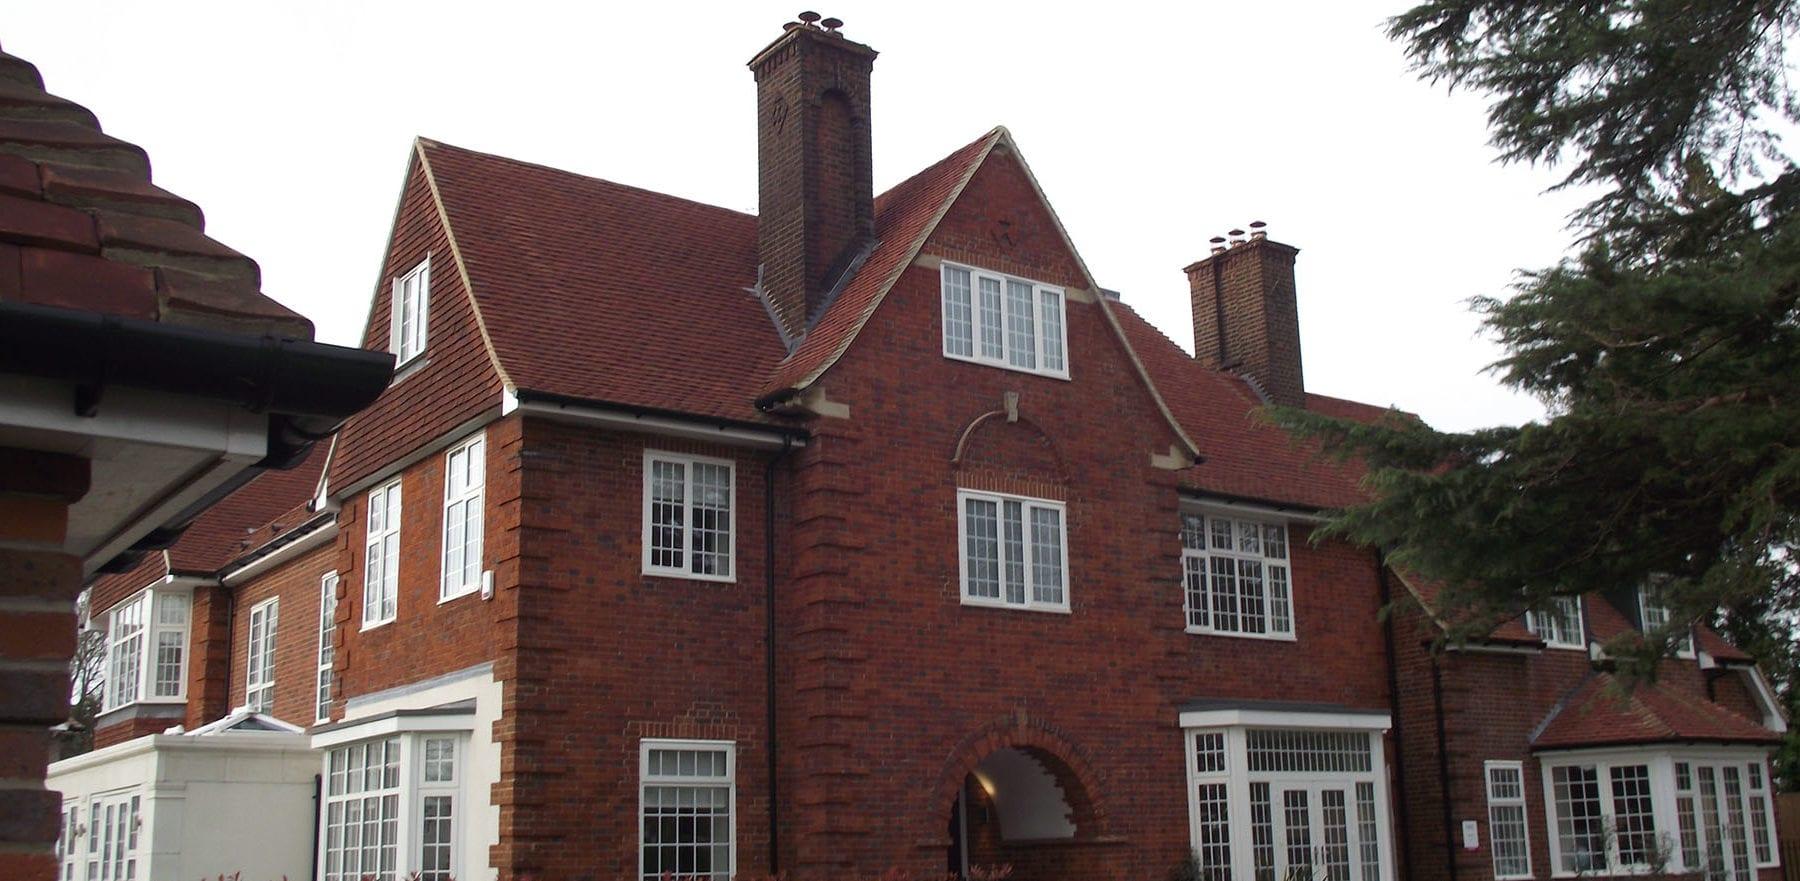 Lifestiles - Handmade Heather Clay Roof Tiles - Bickley, England 5